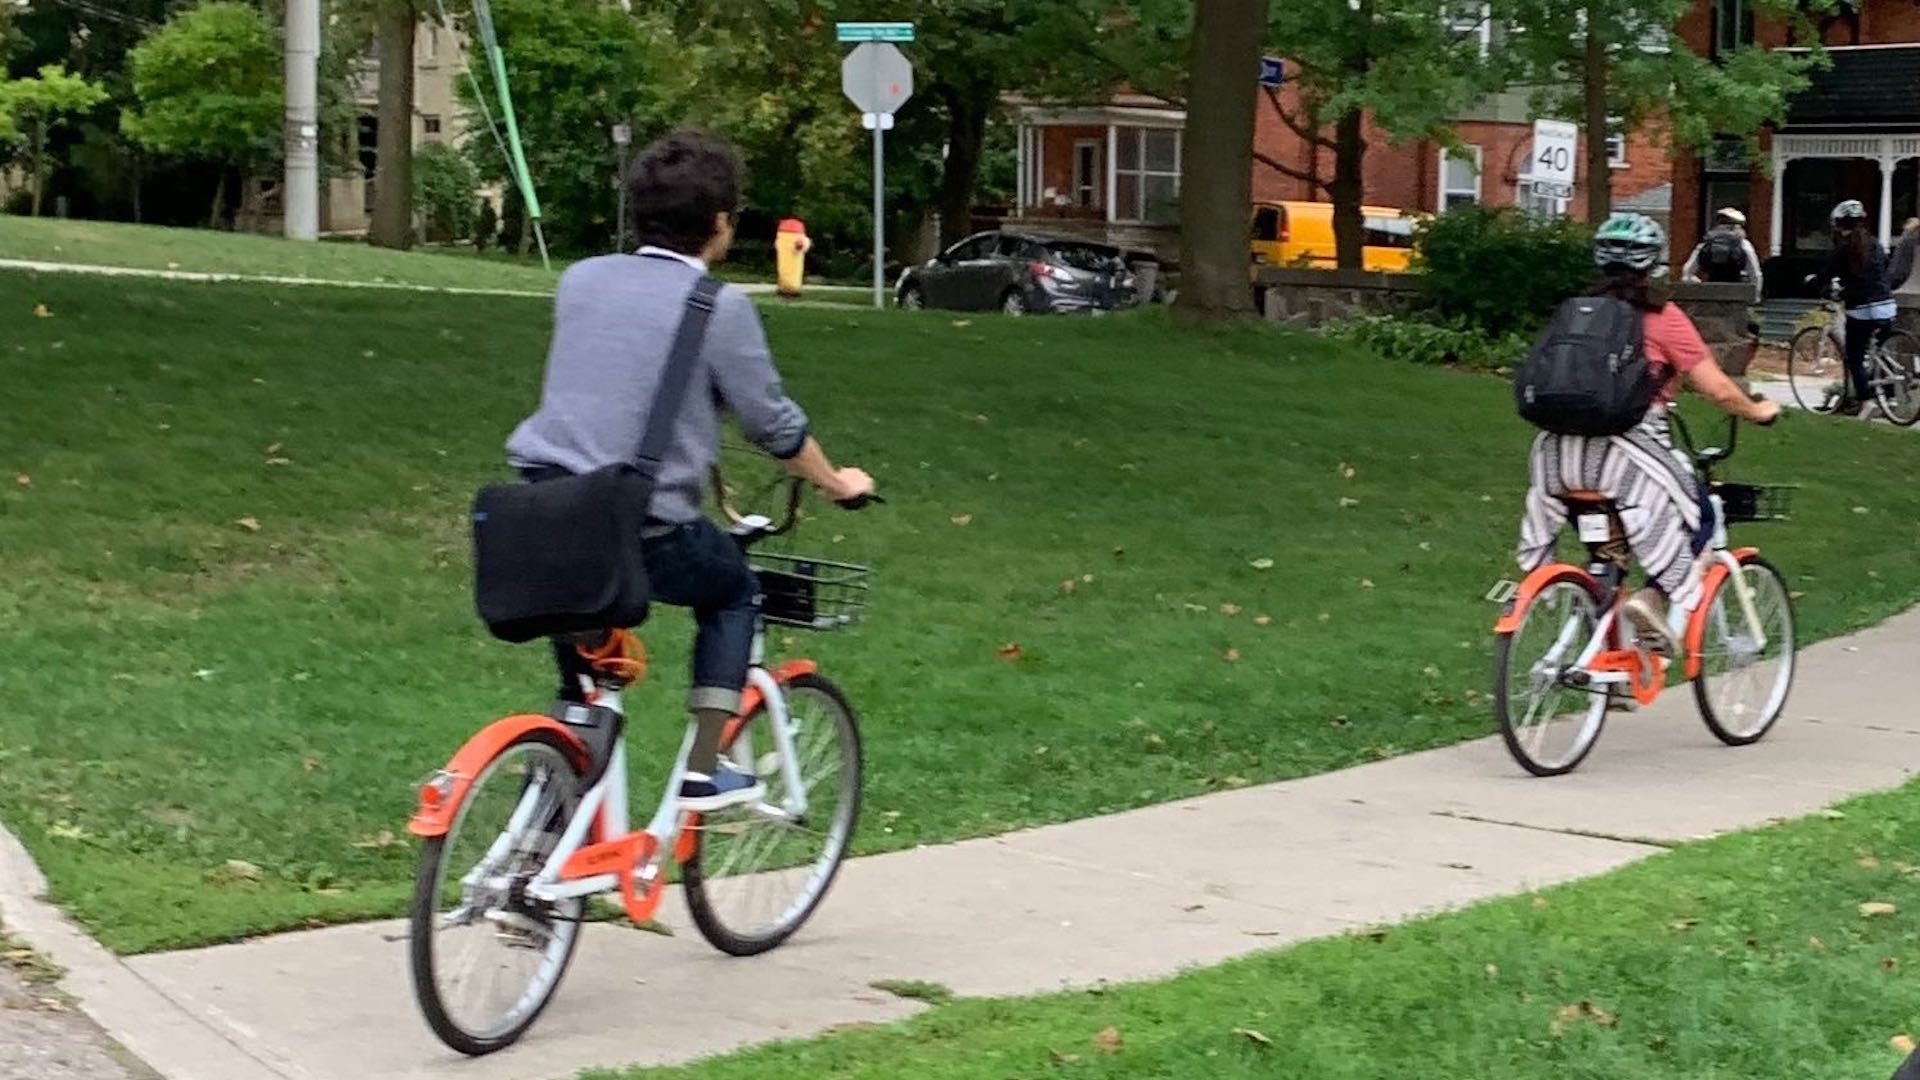 Two people ride Drop Mobility bikes along a sidewalk